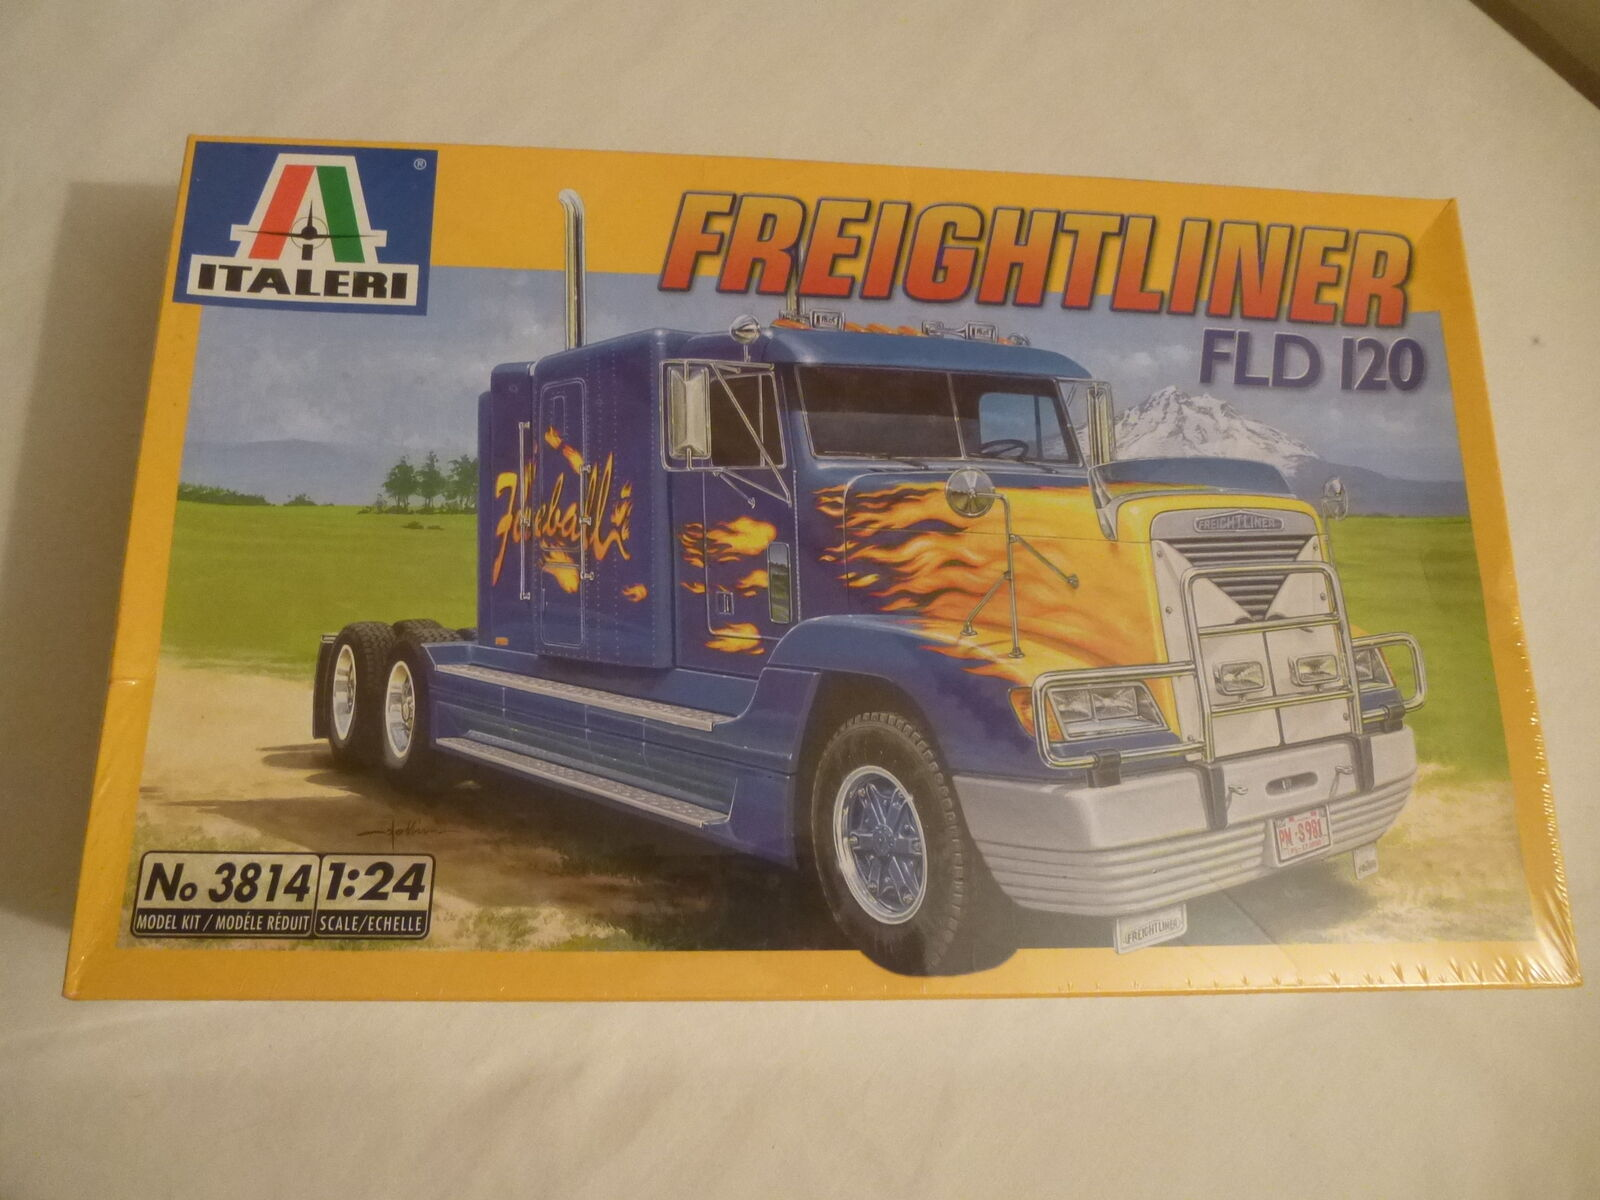 Italeri 1 24 Freightliner FLD 120